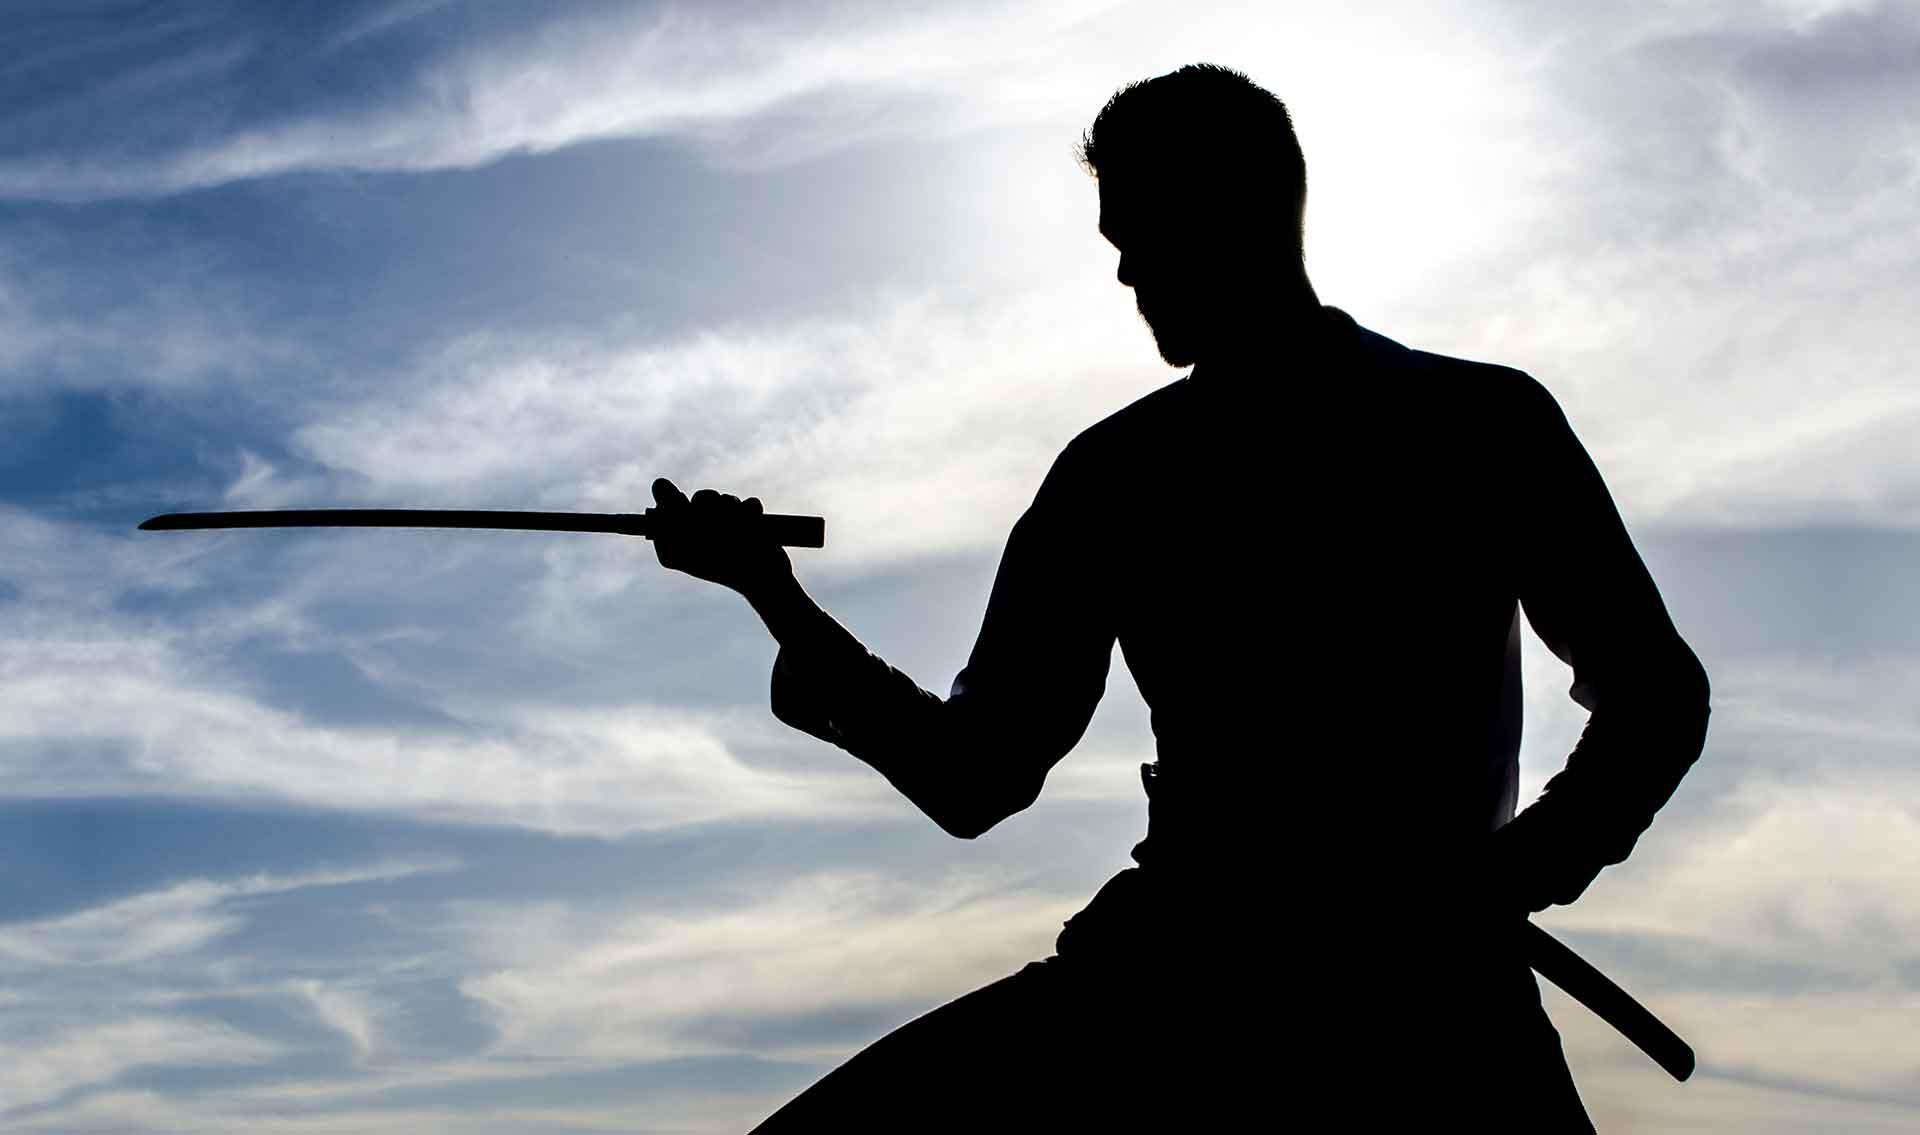 The Samurai Sword